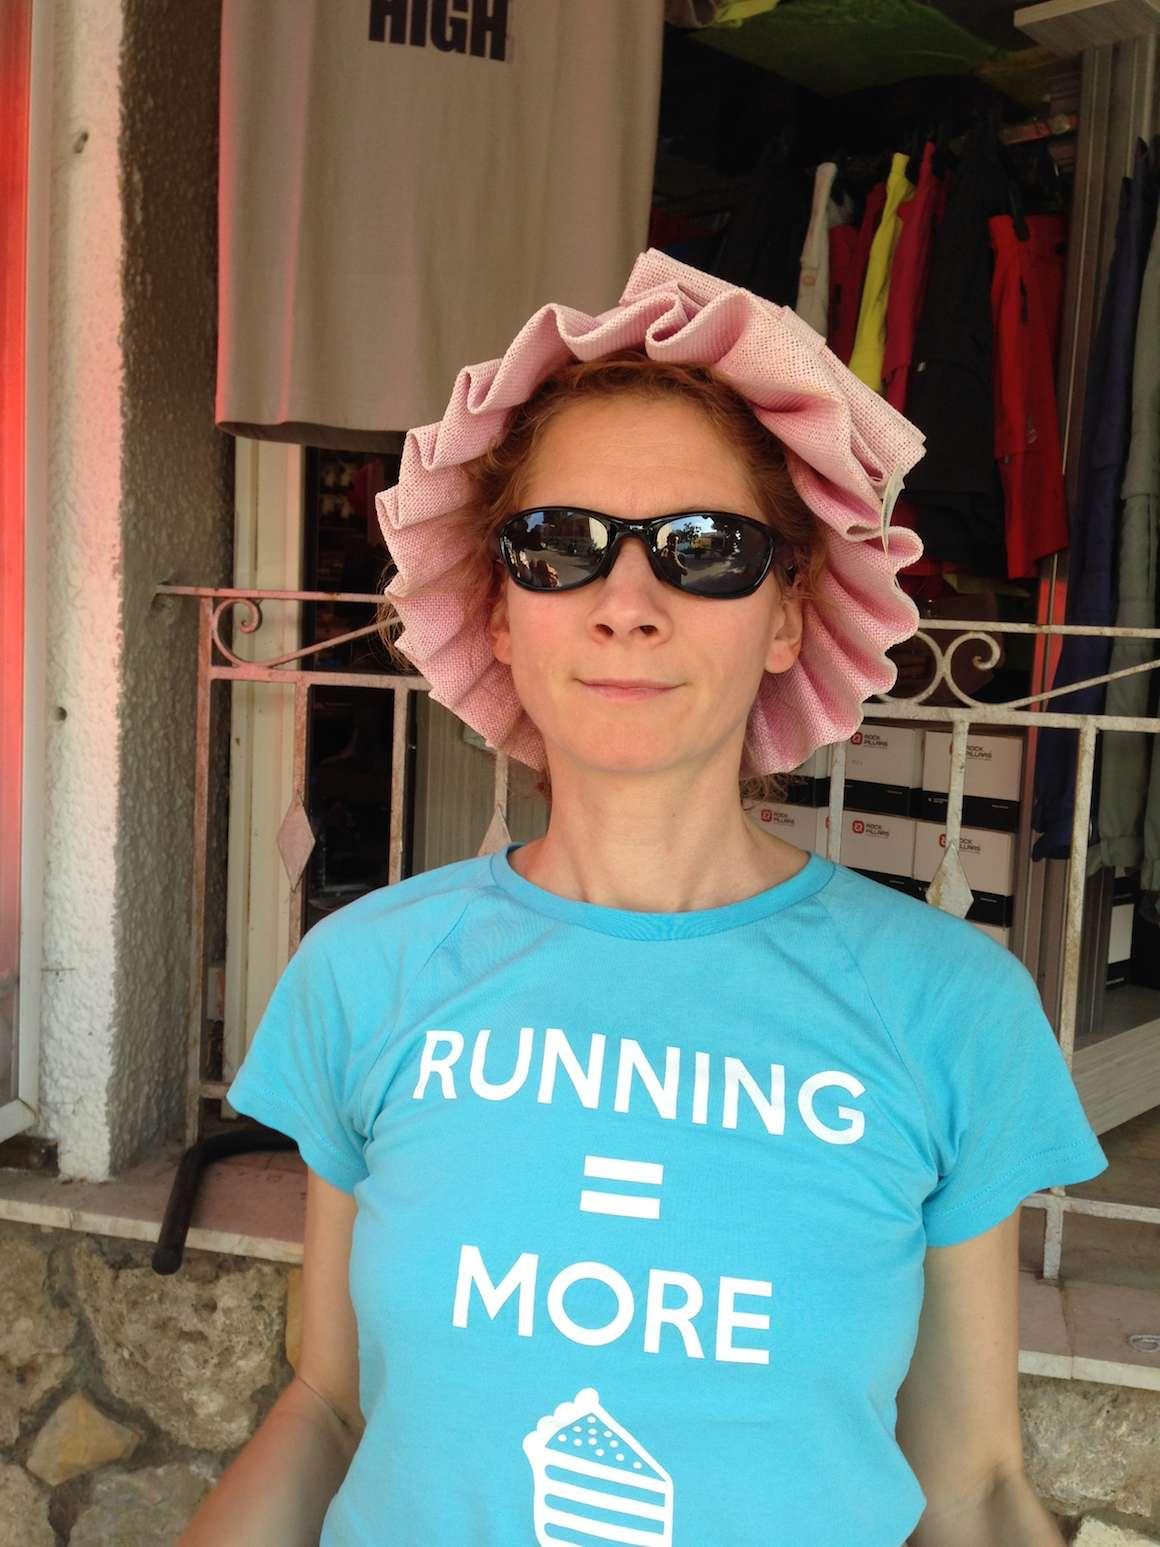 runing t-shirt